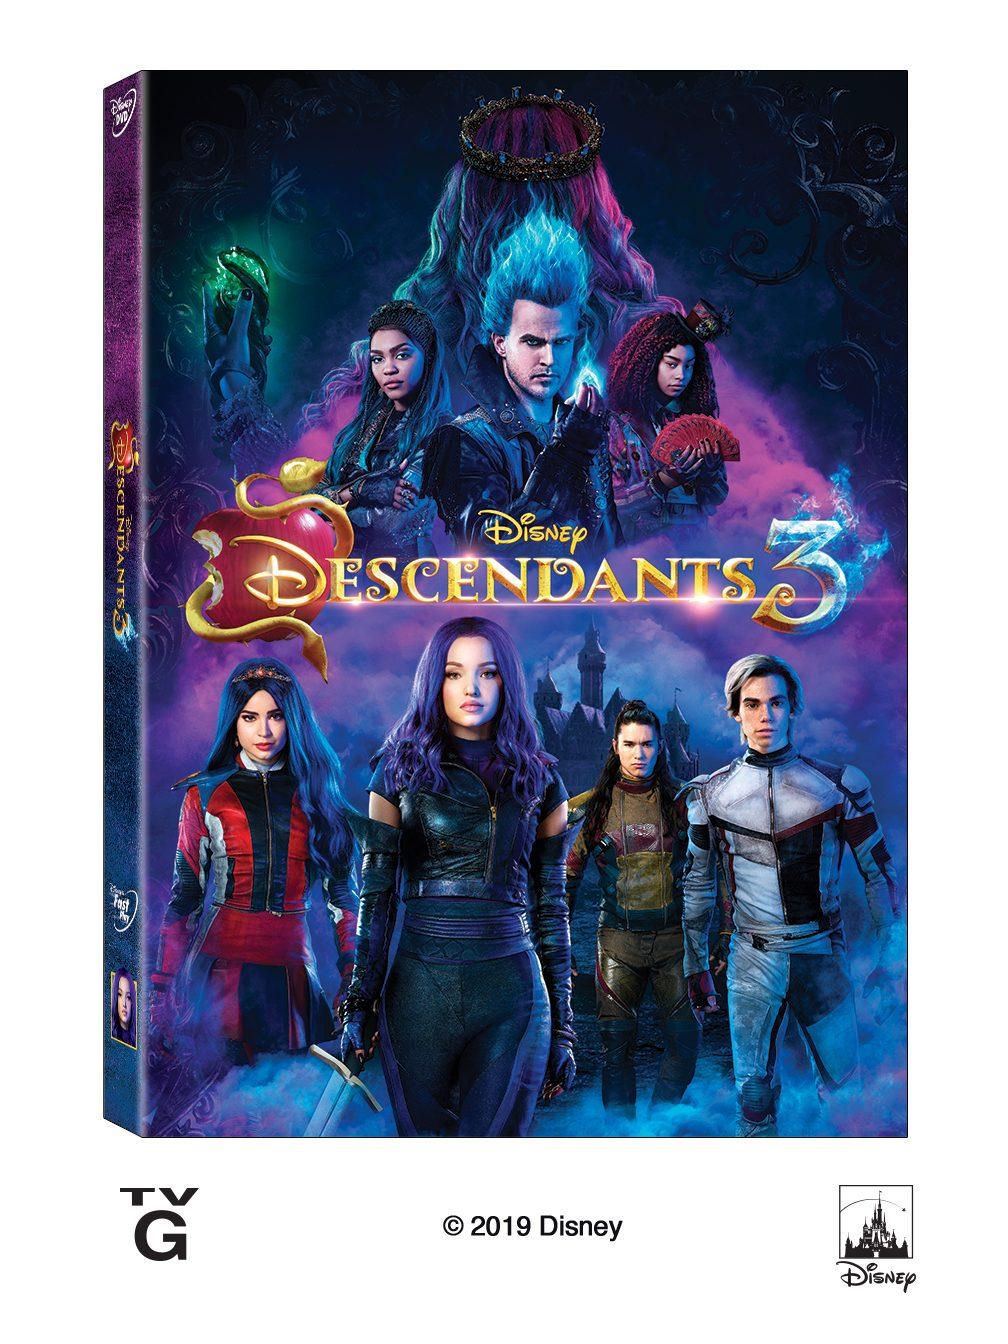 DESCENDANTS 3 Available on Disney DVD August 6th